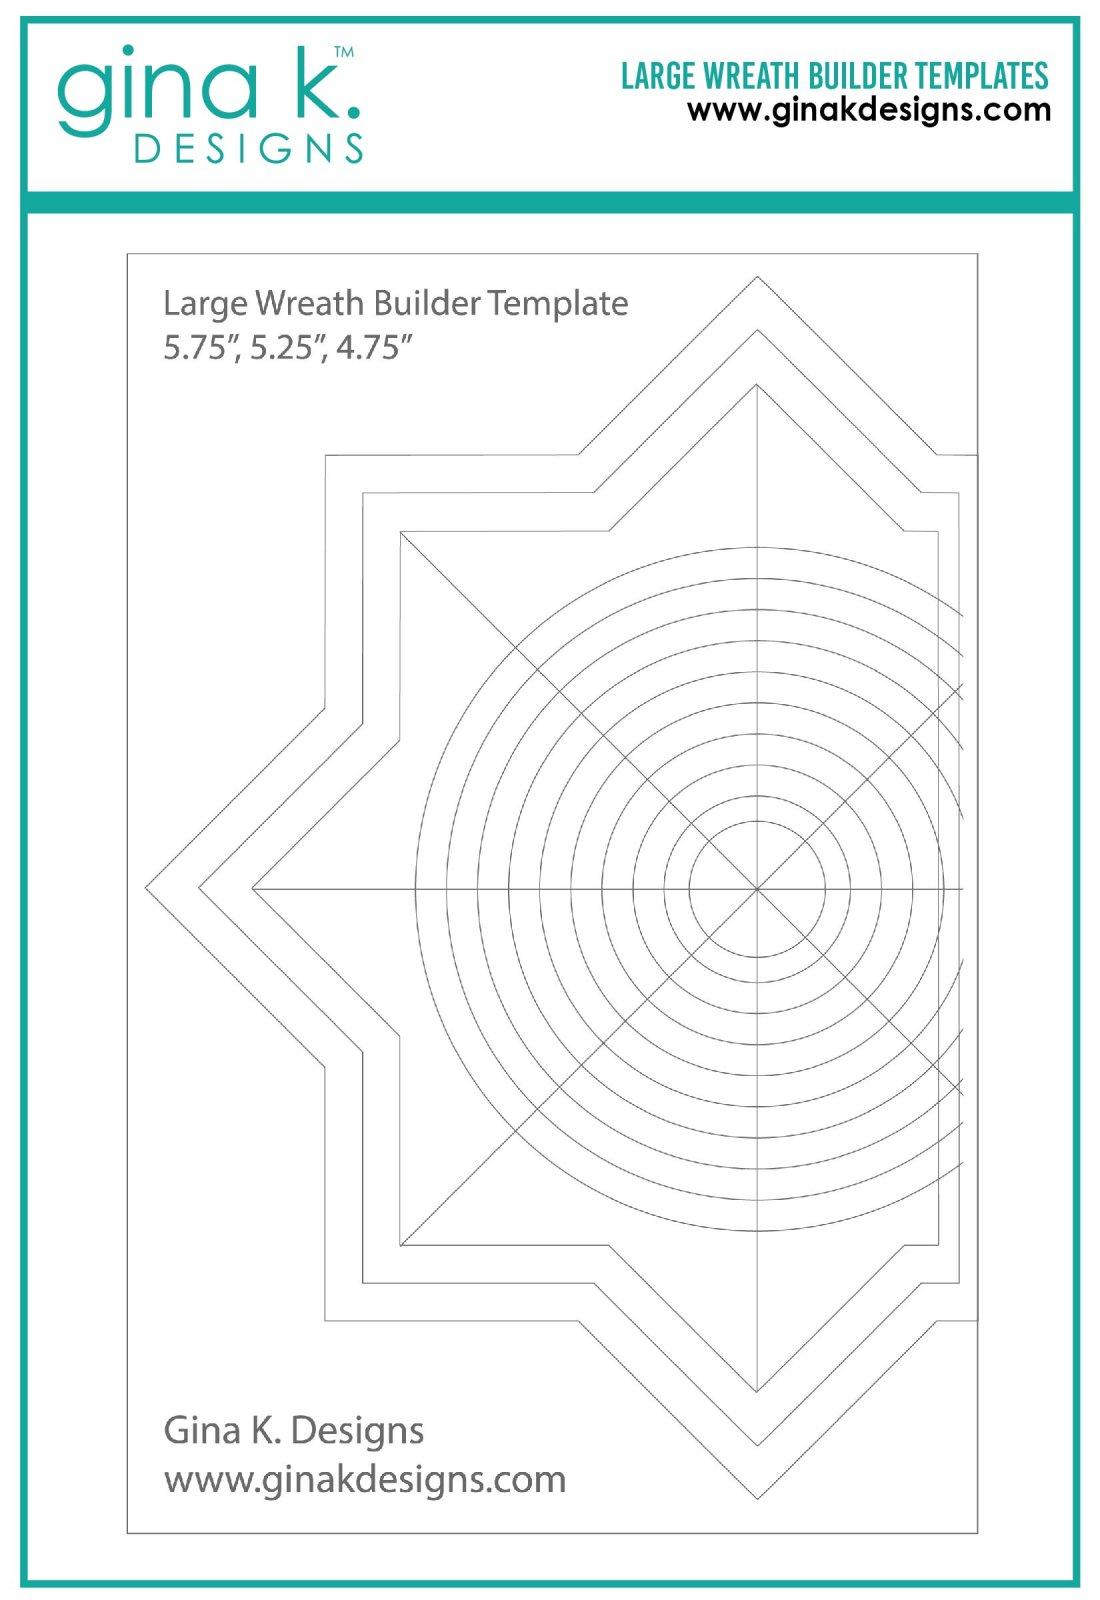 Gina K Designs Large Wreath Builder Template